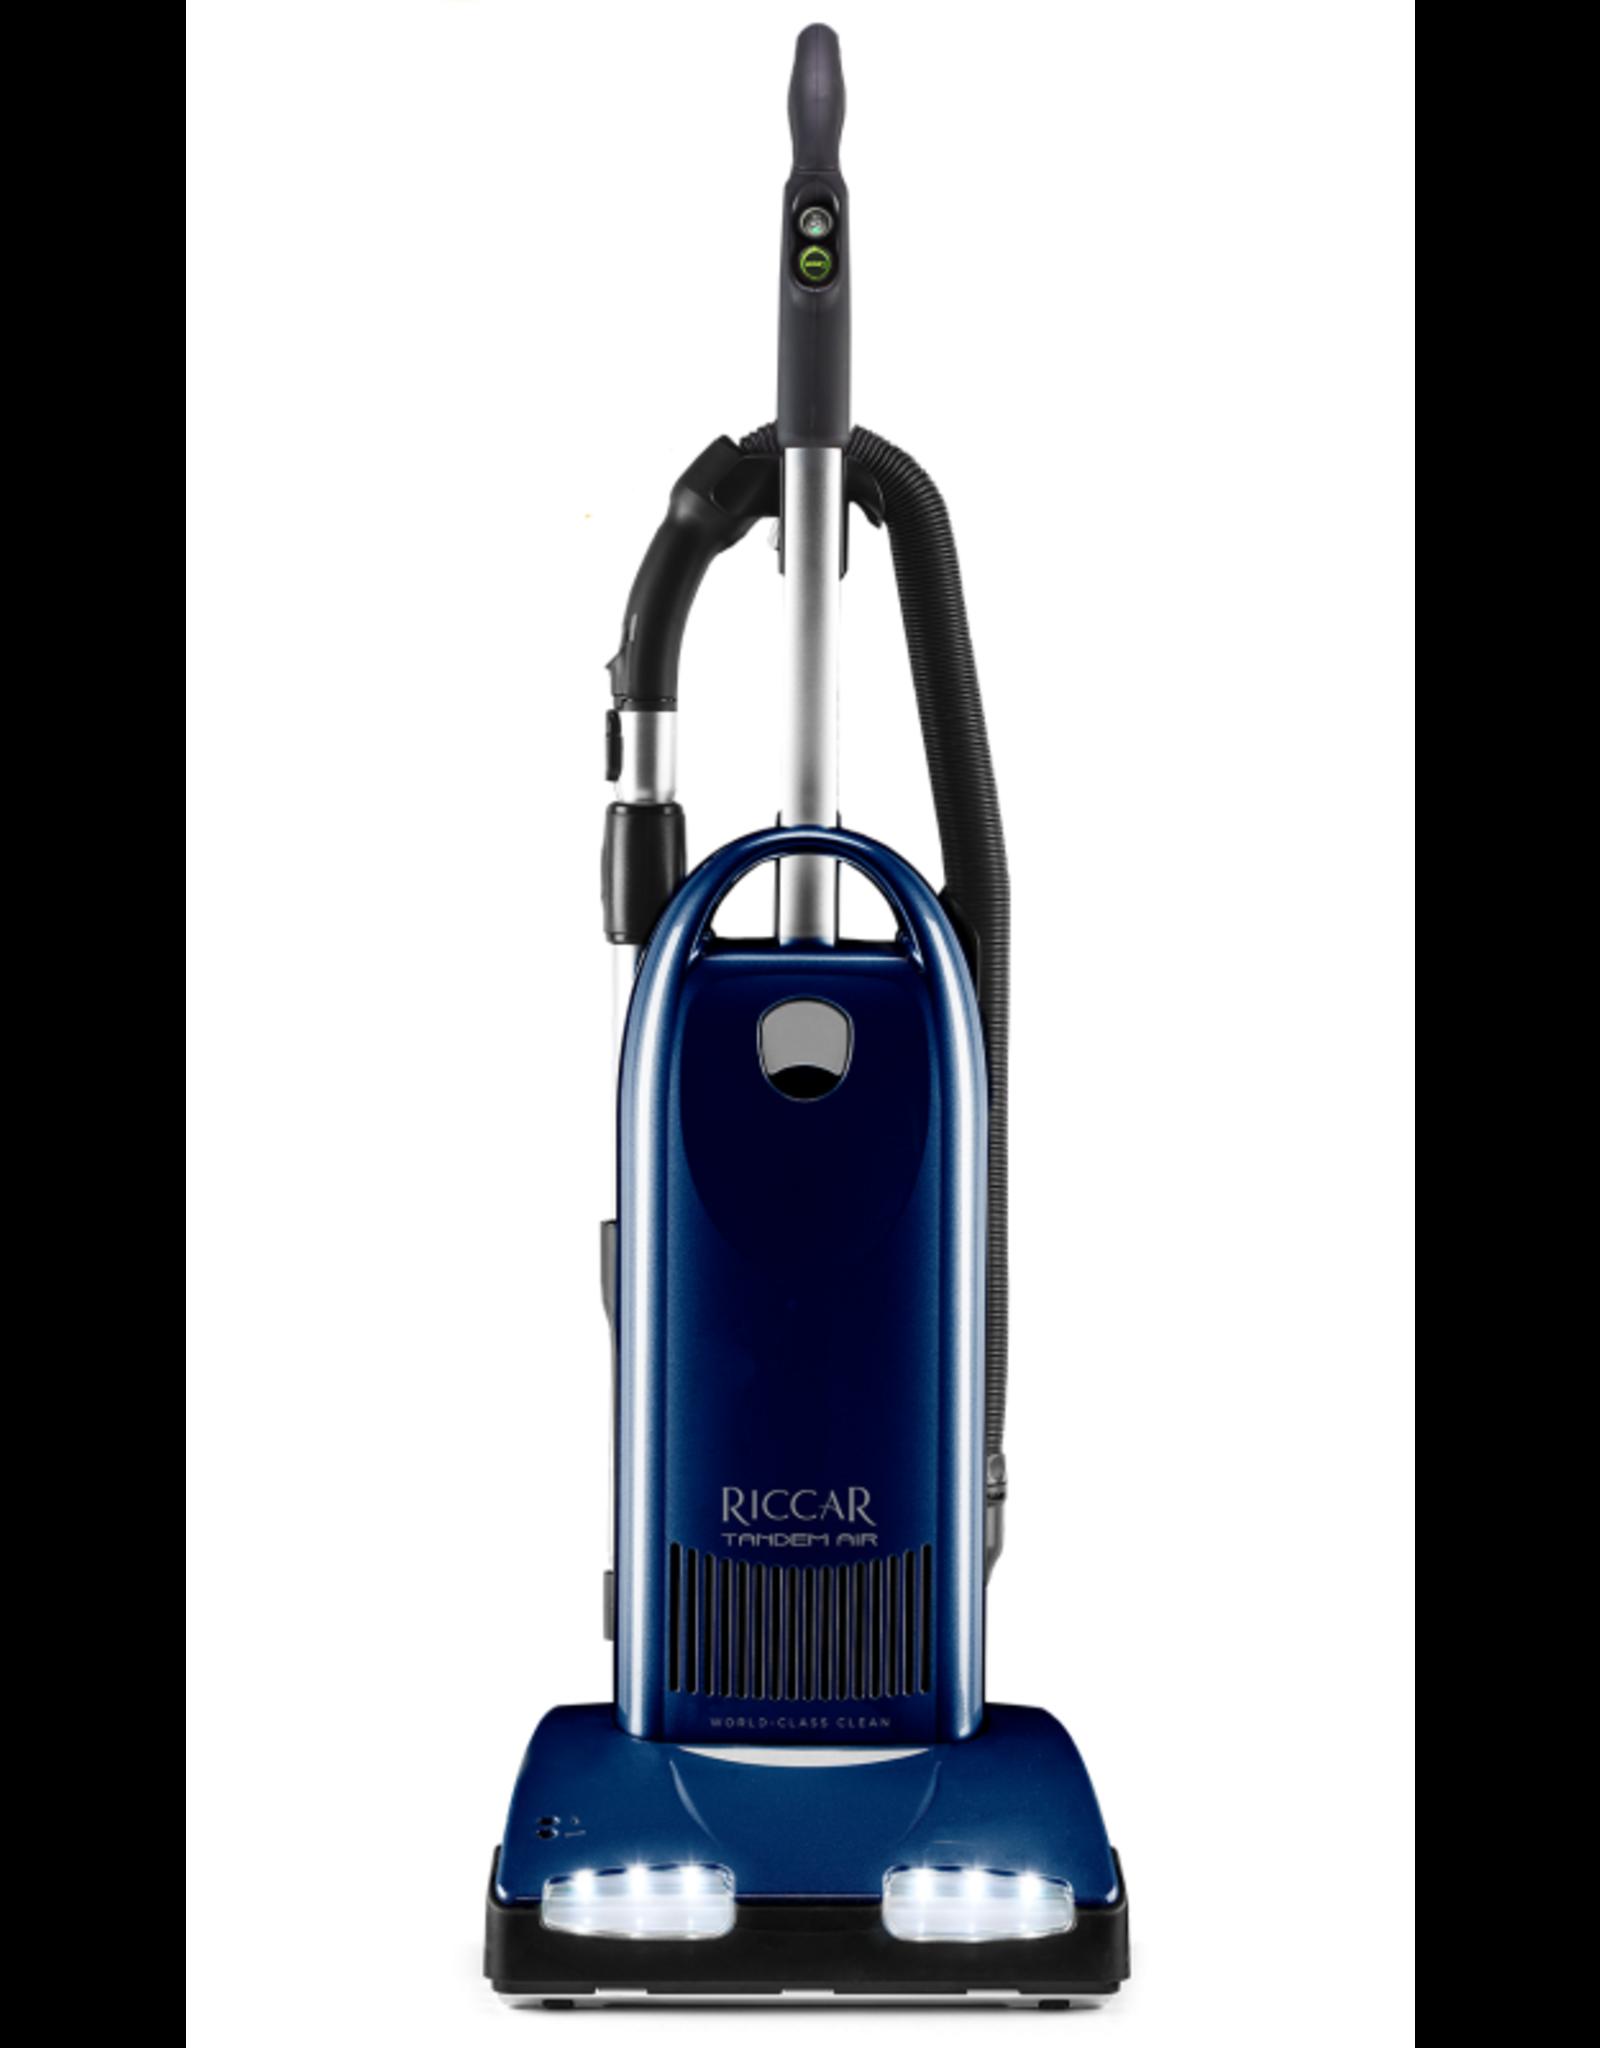 Riccar Riccar 30 Series Deluxe Upright Vacuum R30D